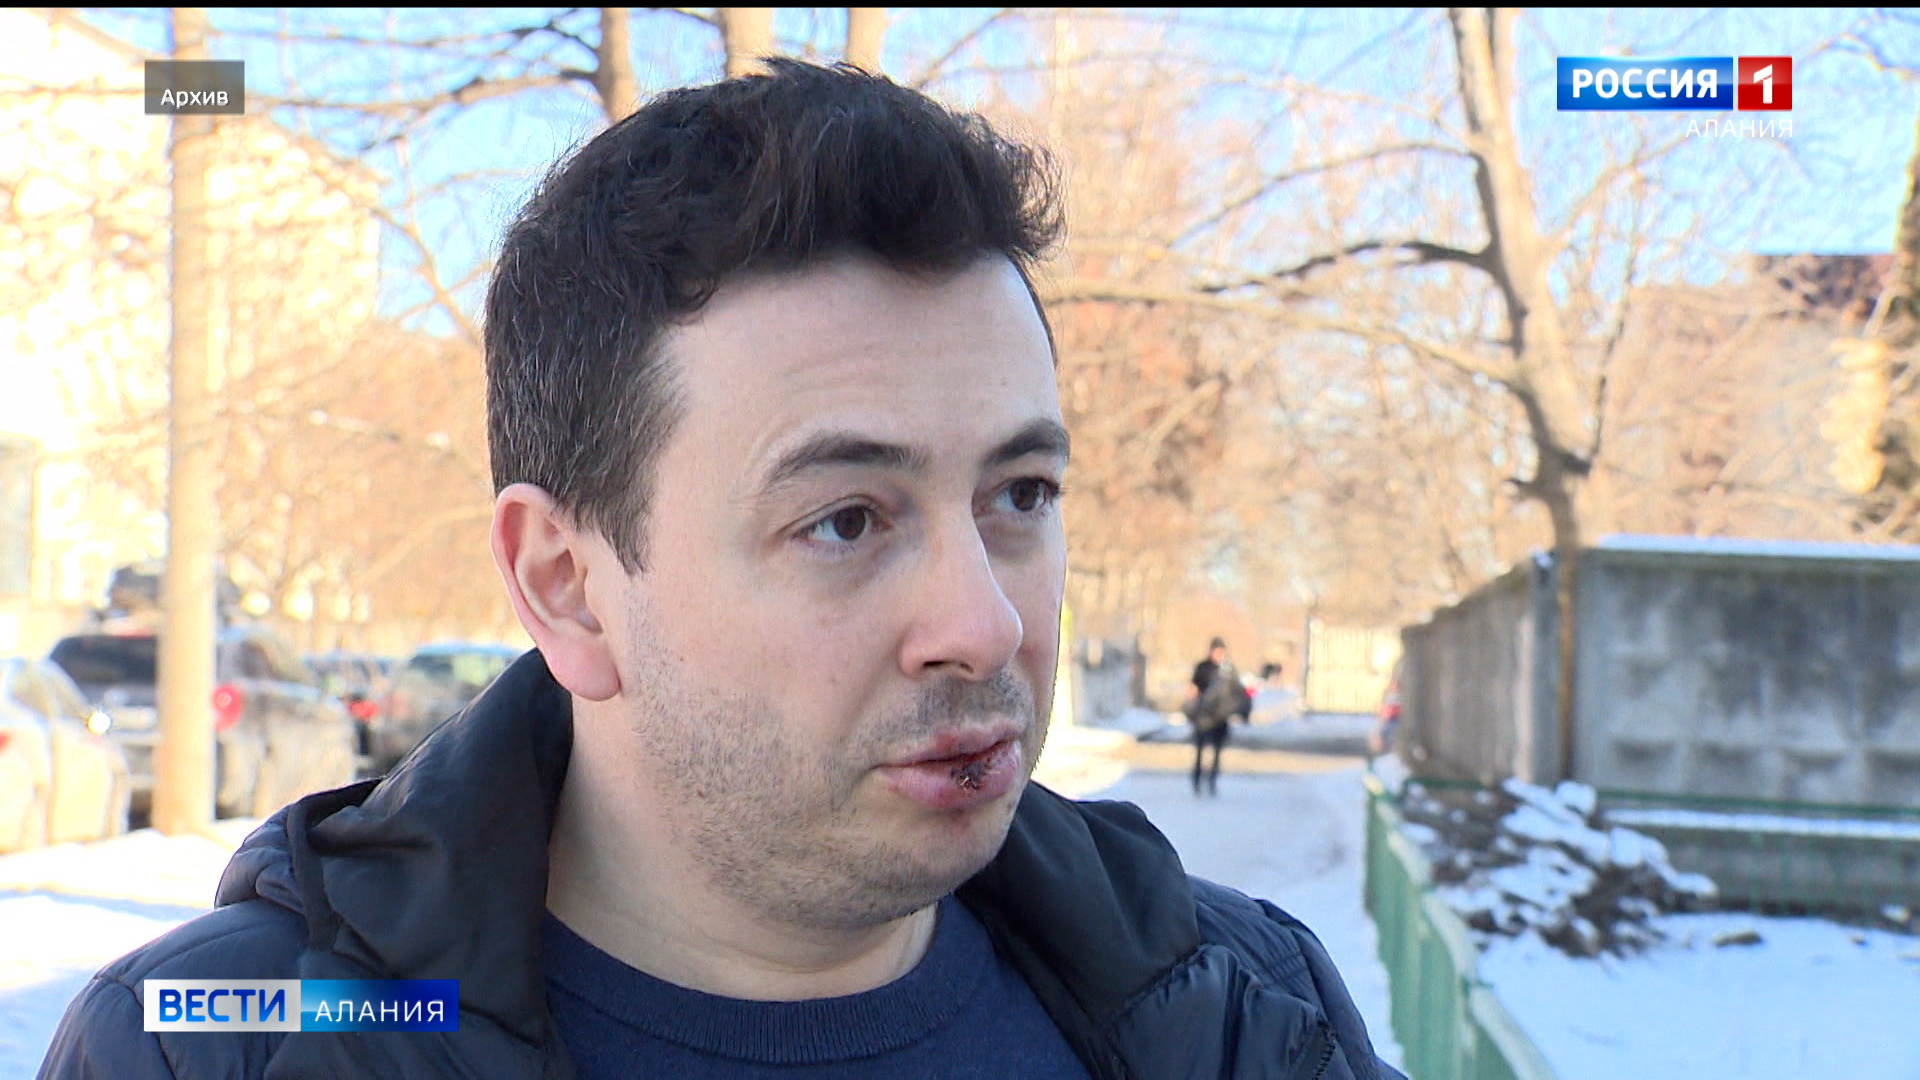 Дело о нападении на журналиста Руслана Тотрова передано в суд